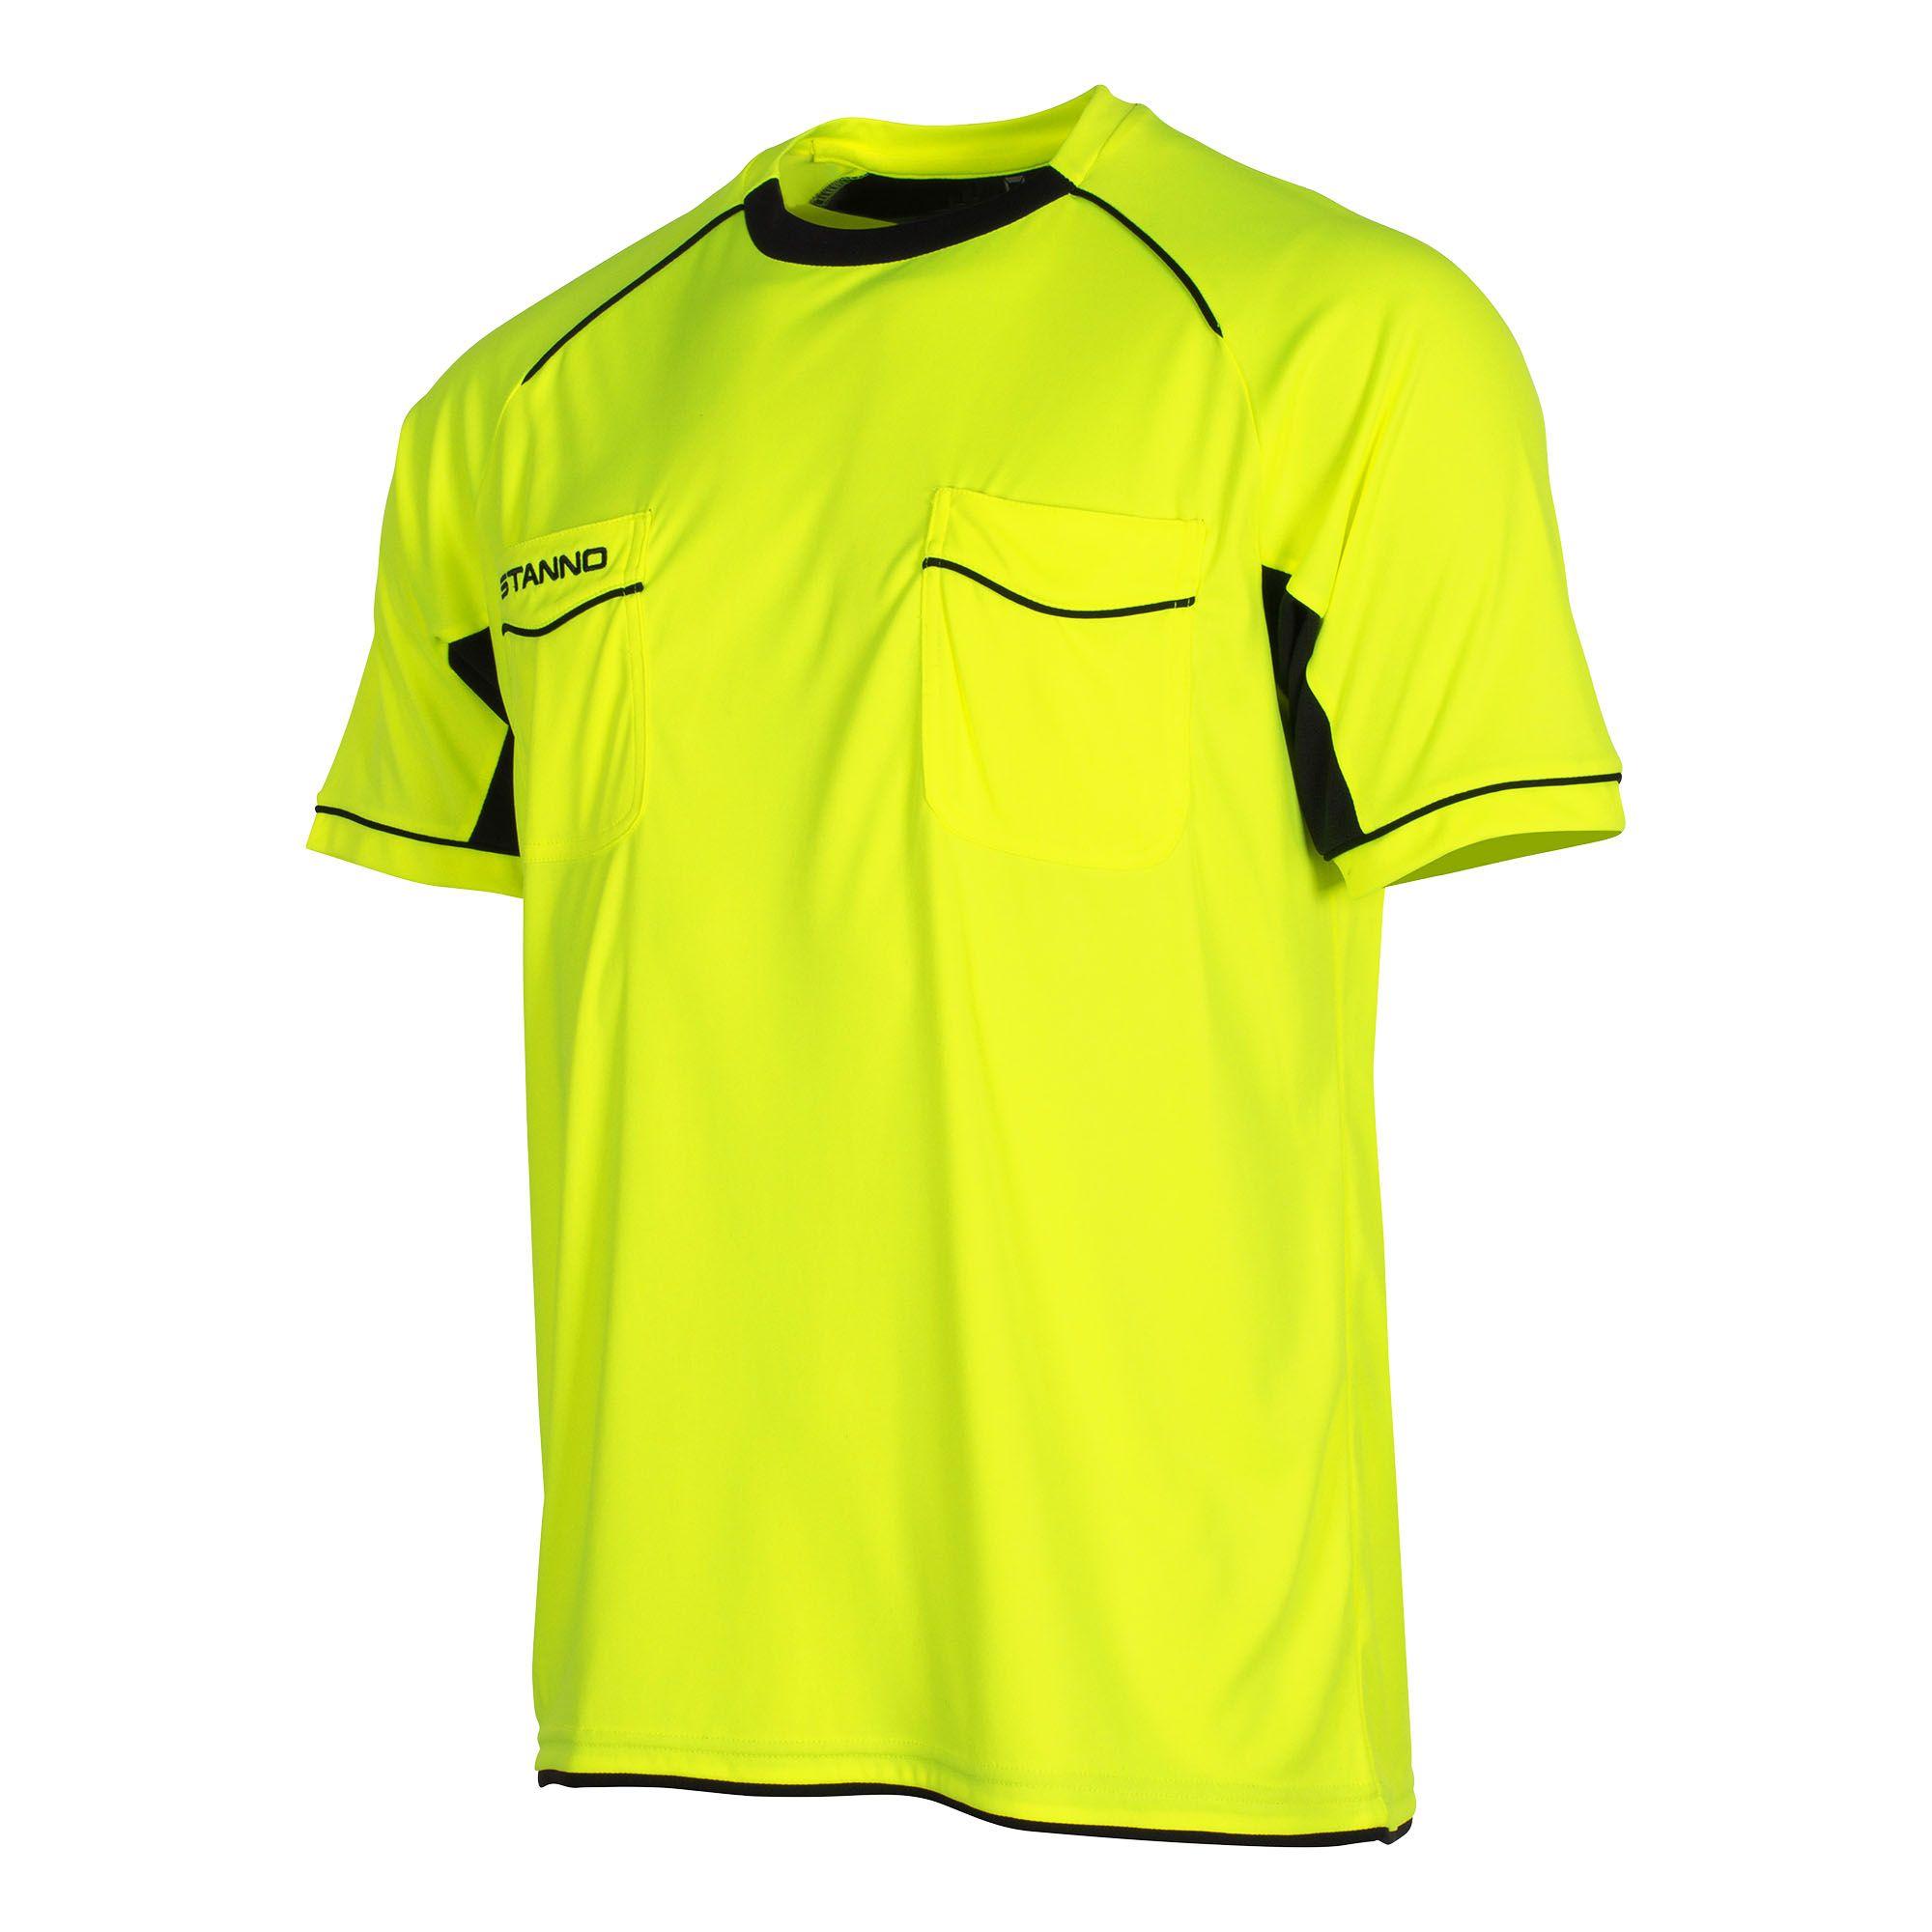 online retailer 41106 39724 Bergamo Schiedsrichter Trikot Kurzarm